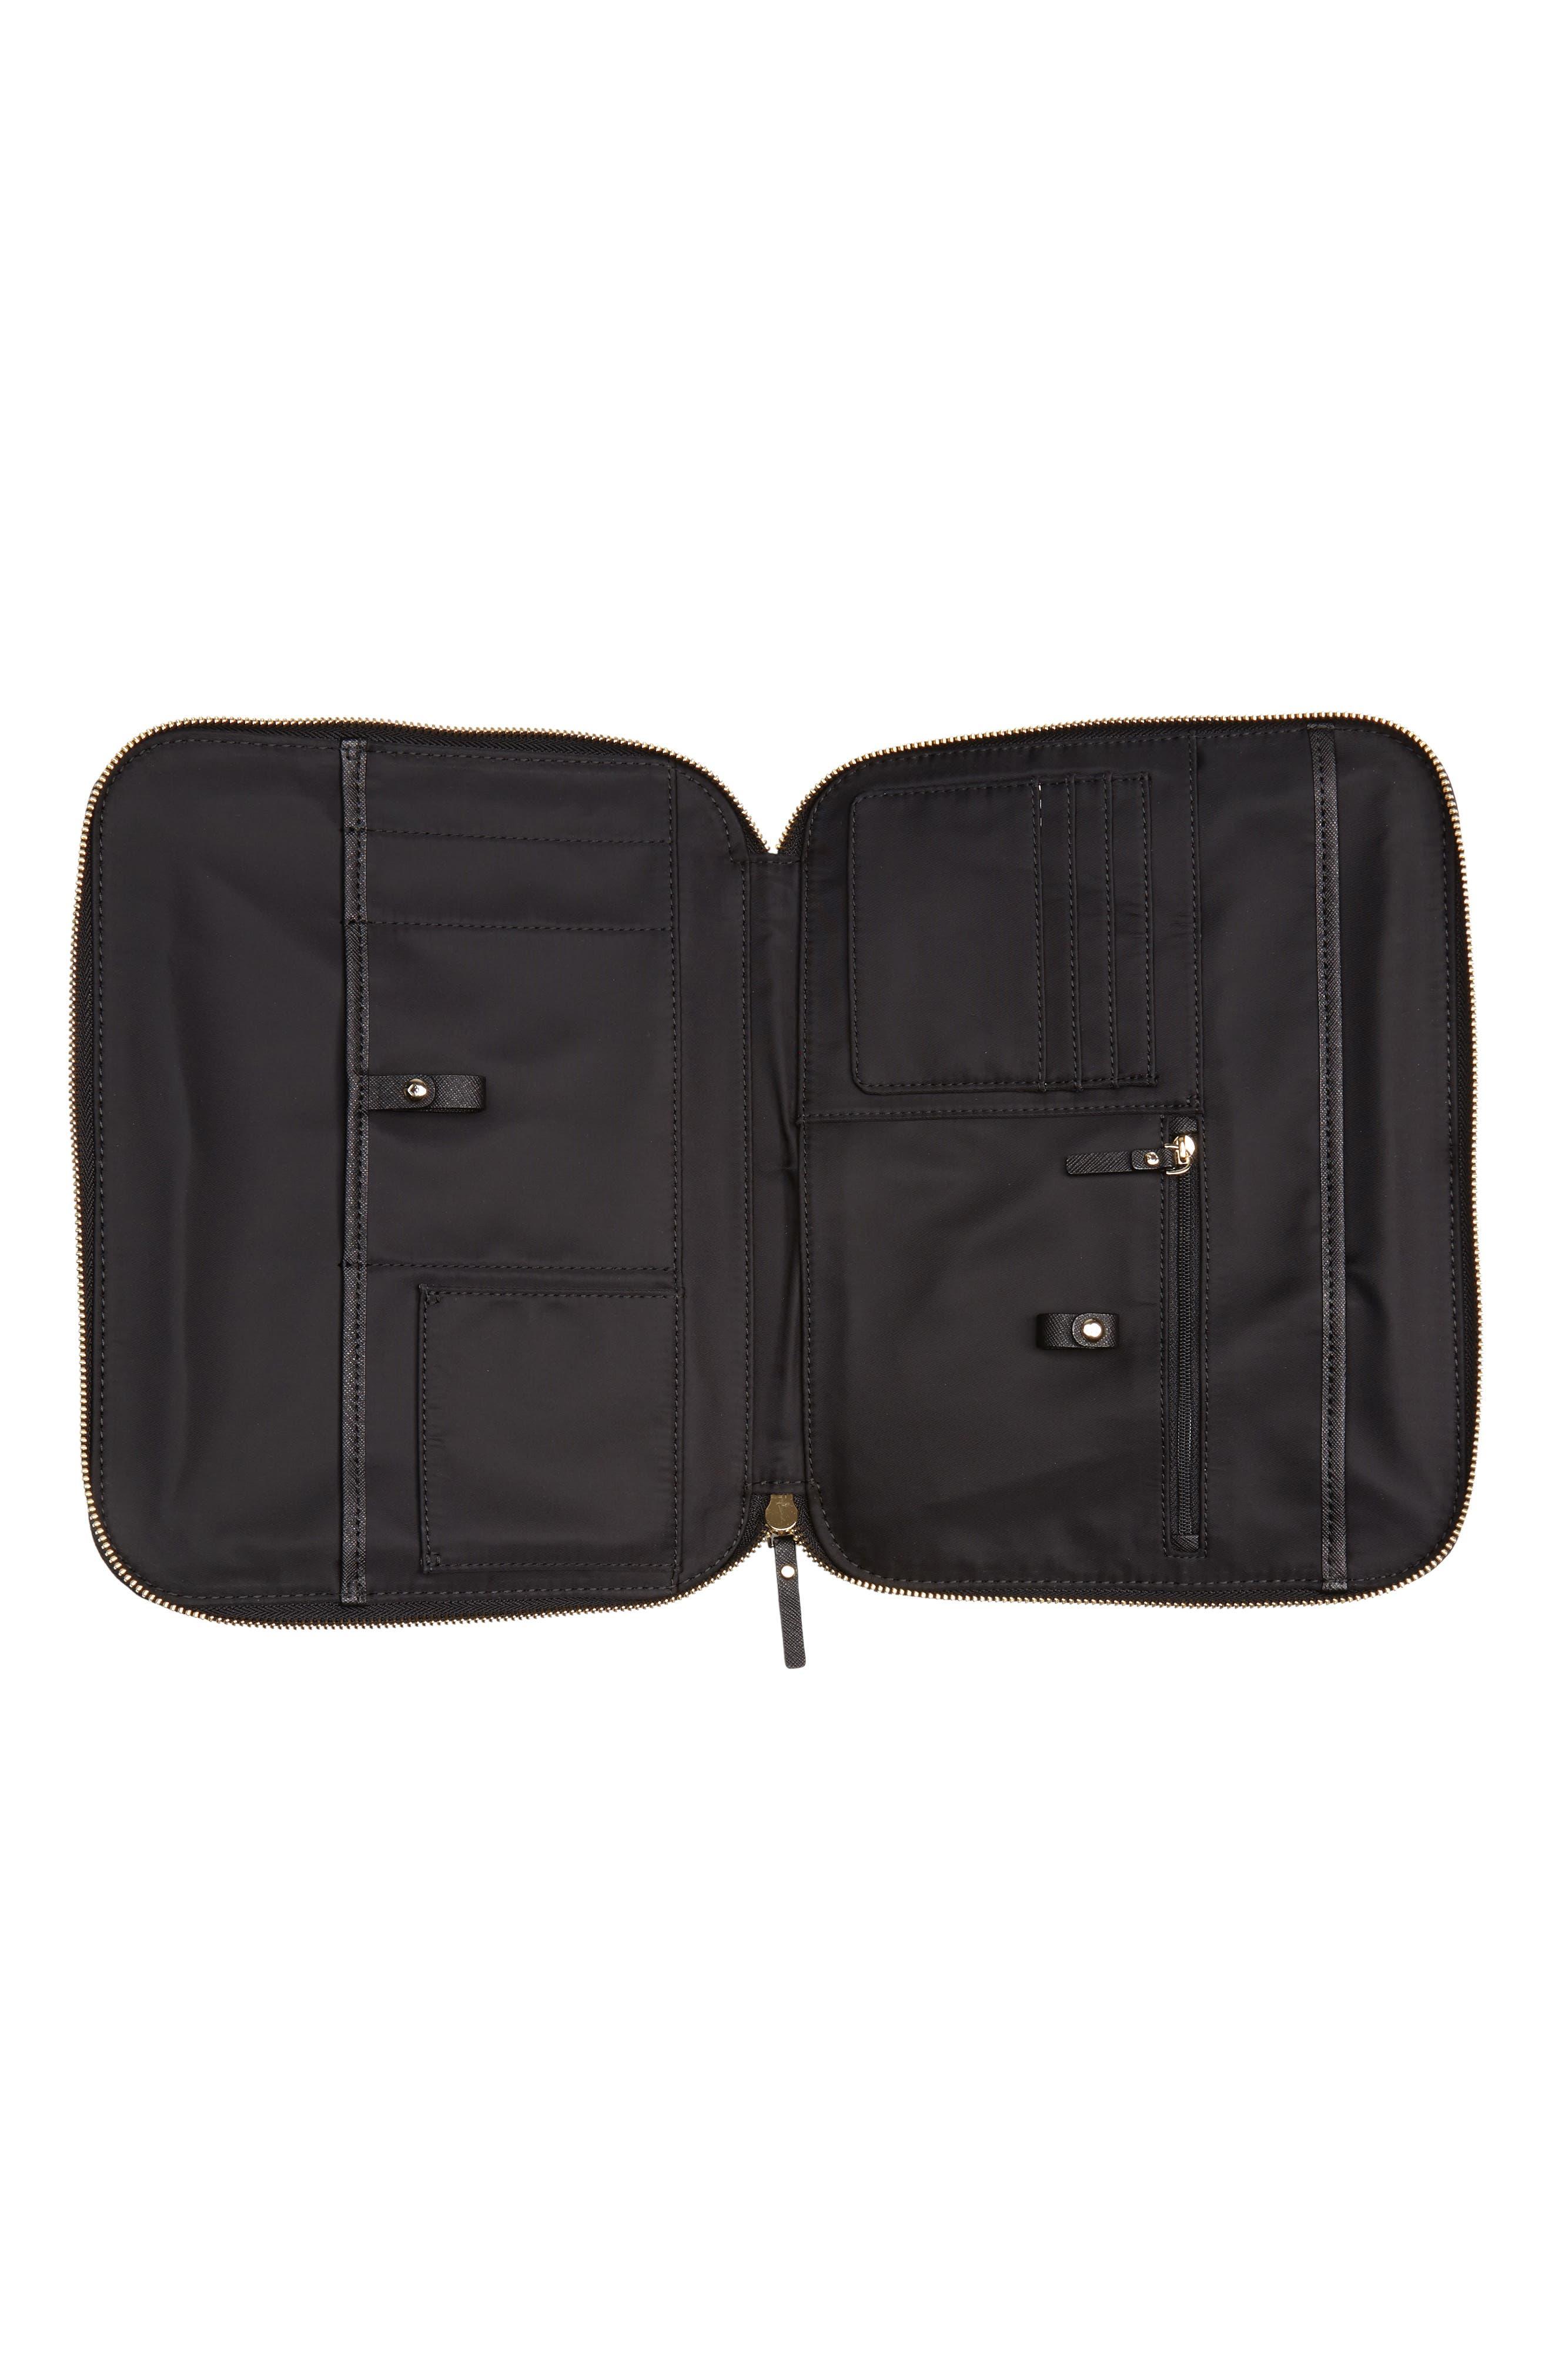 saffiano leather organization tablet sleeve,                             Alternate thumbnail 2, color,                             Black